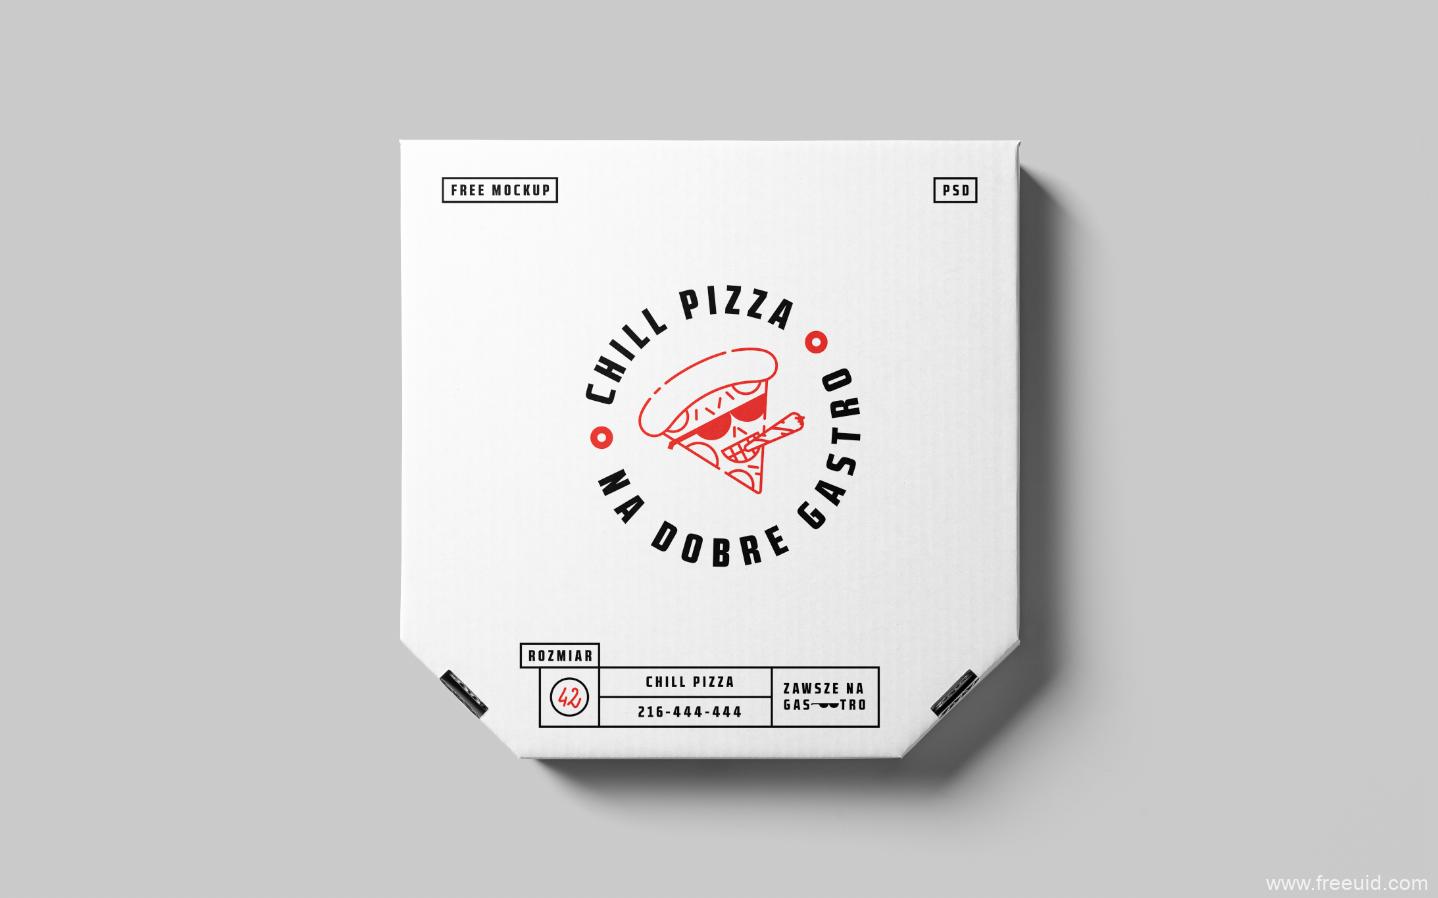 Pizza包装盒样机展示模板psd源文件下载